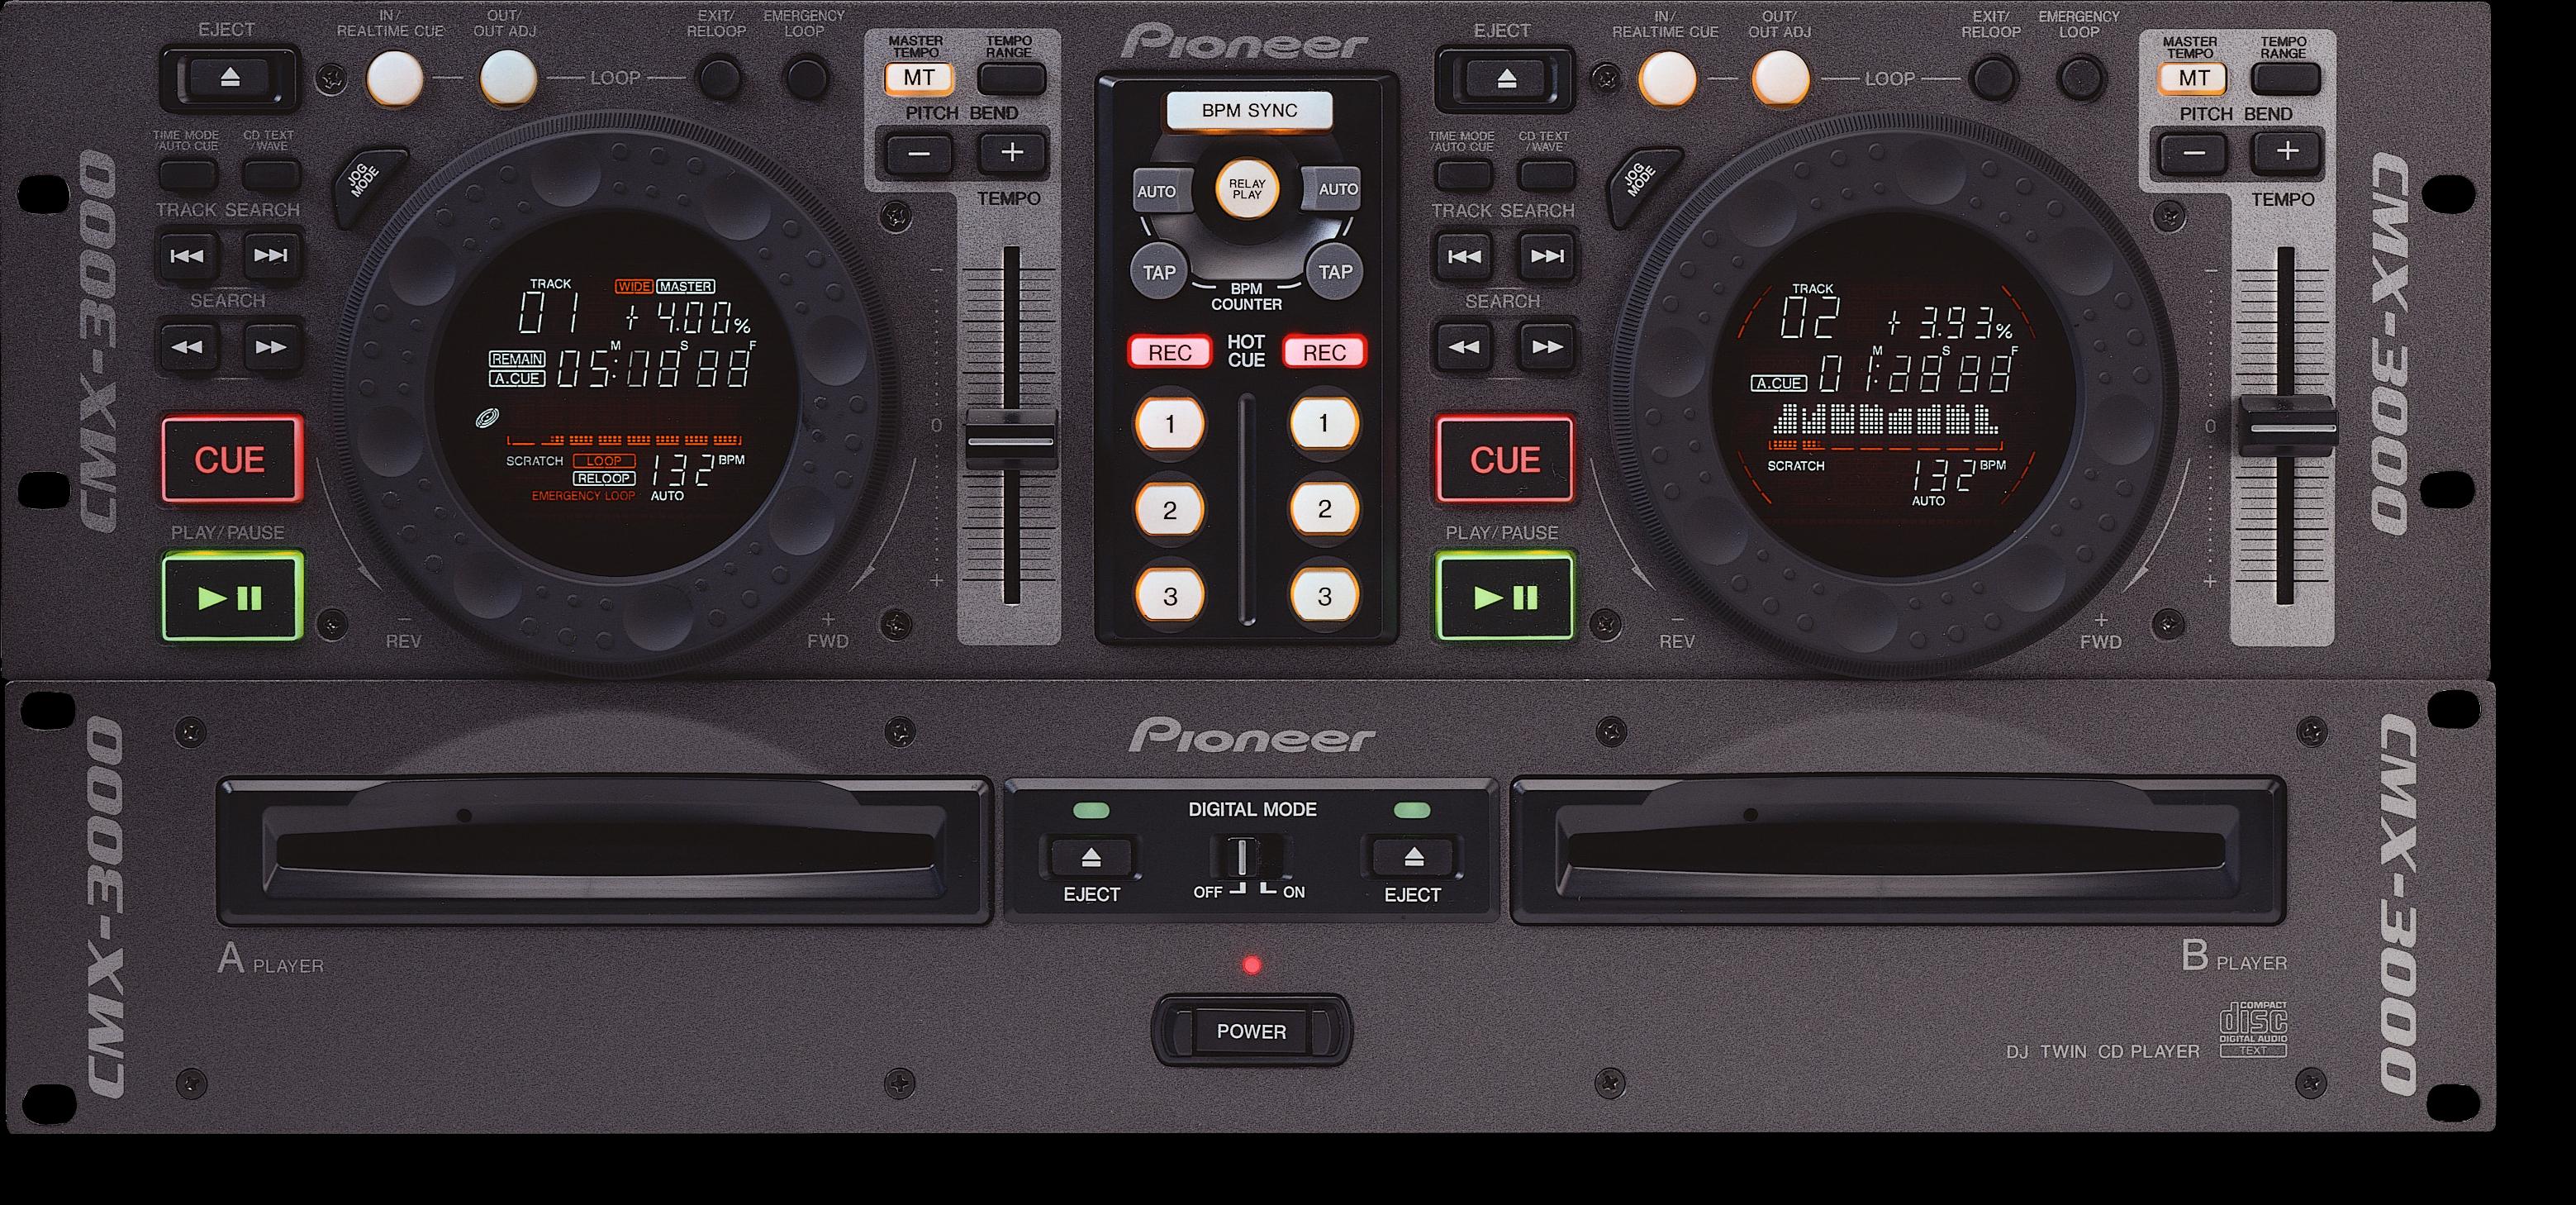 CMX-3000 main